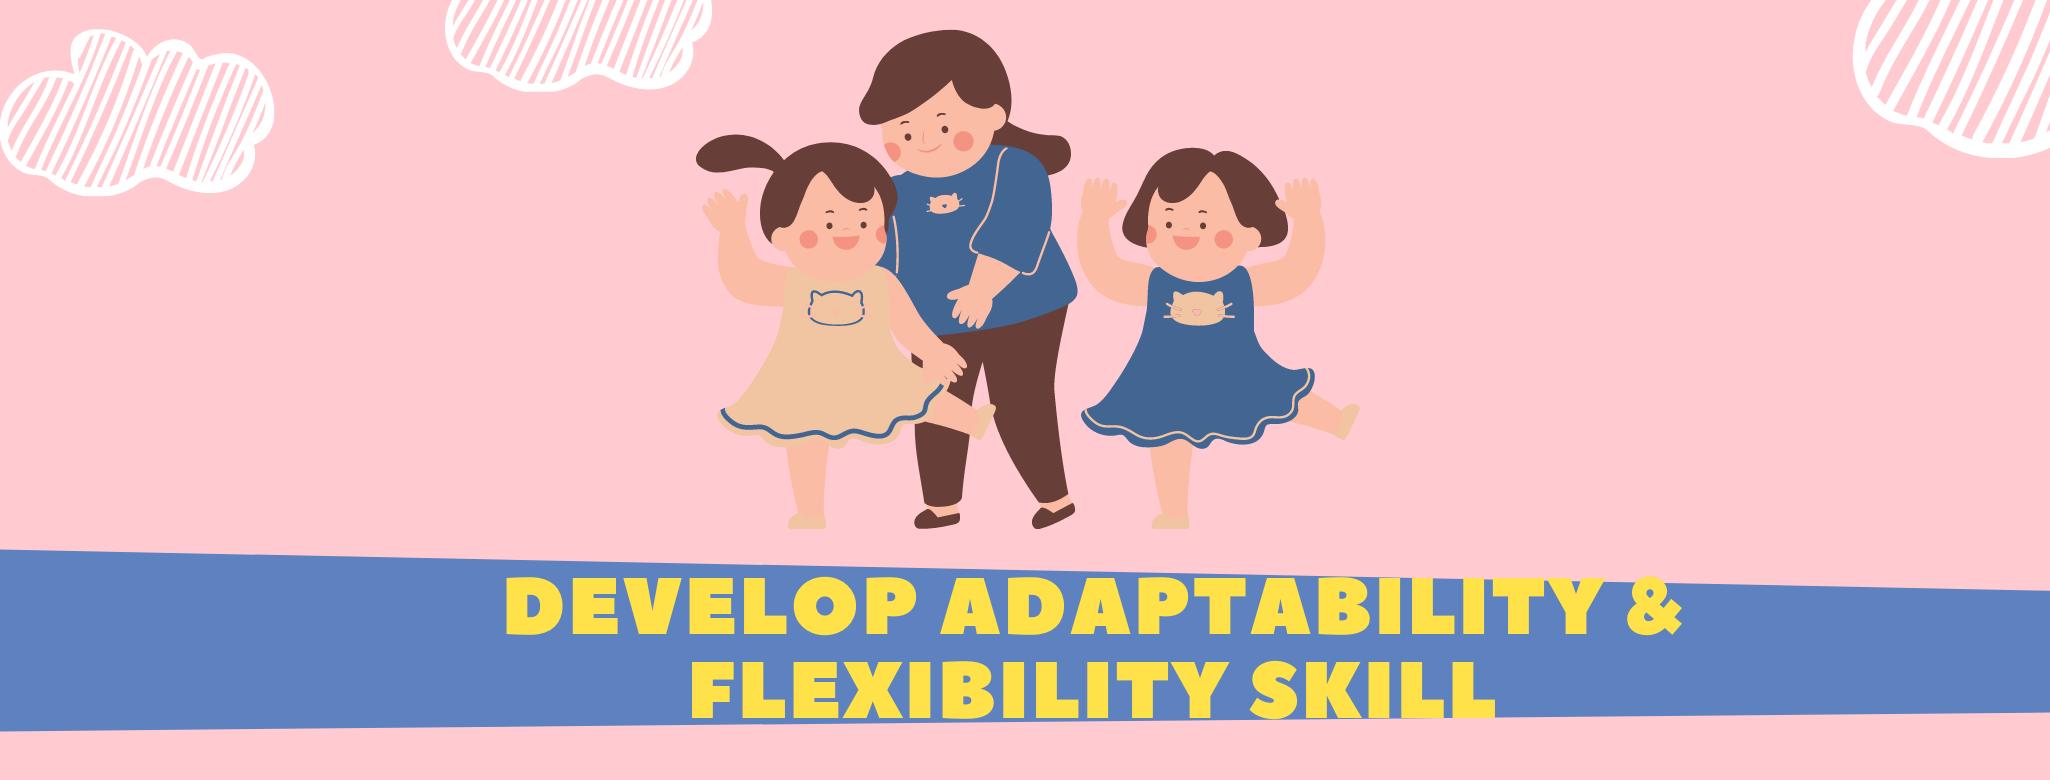 develop Adaptability & flexibility skills for kids children students